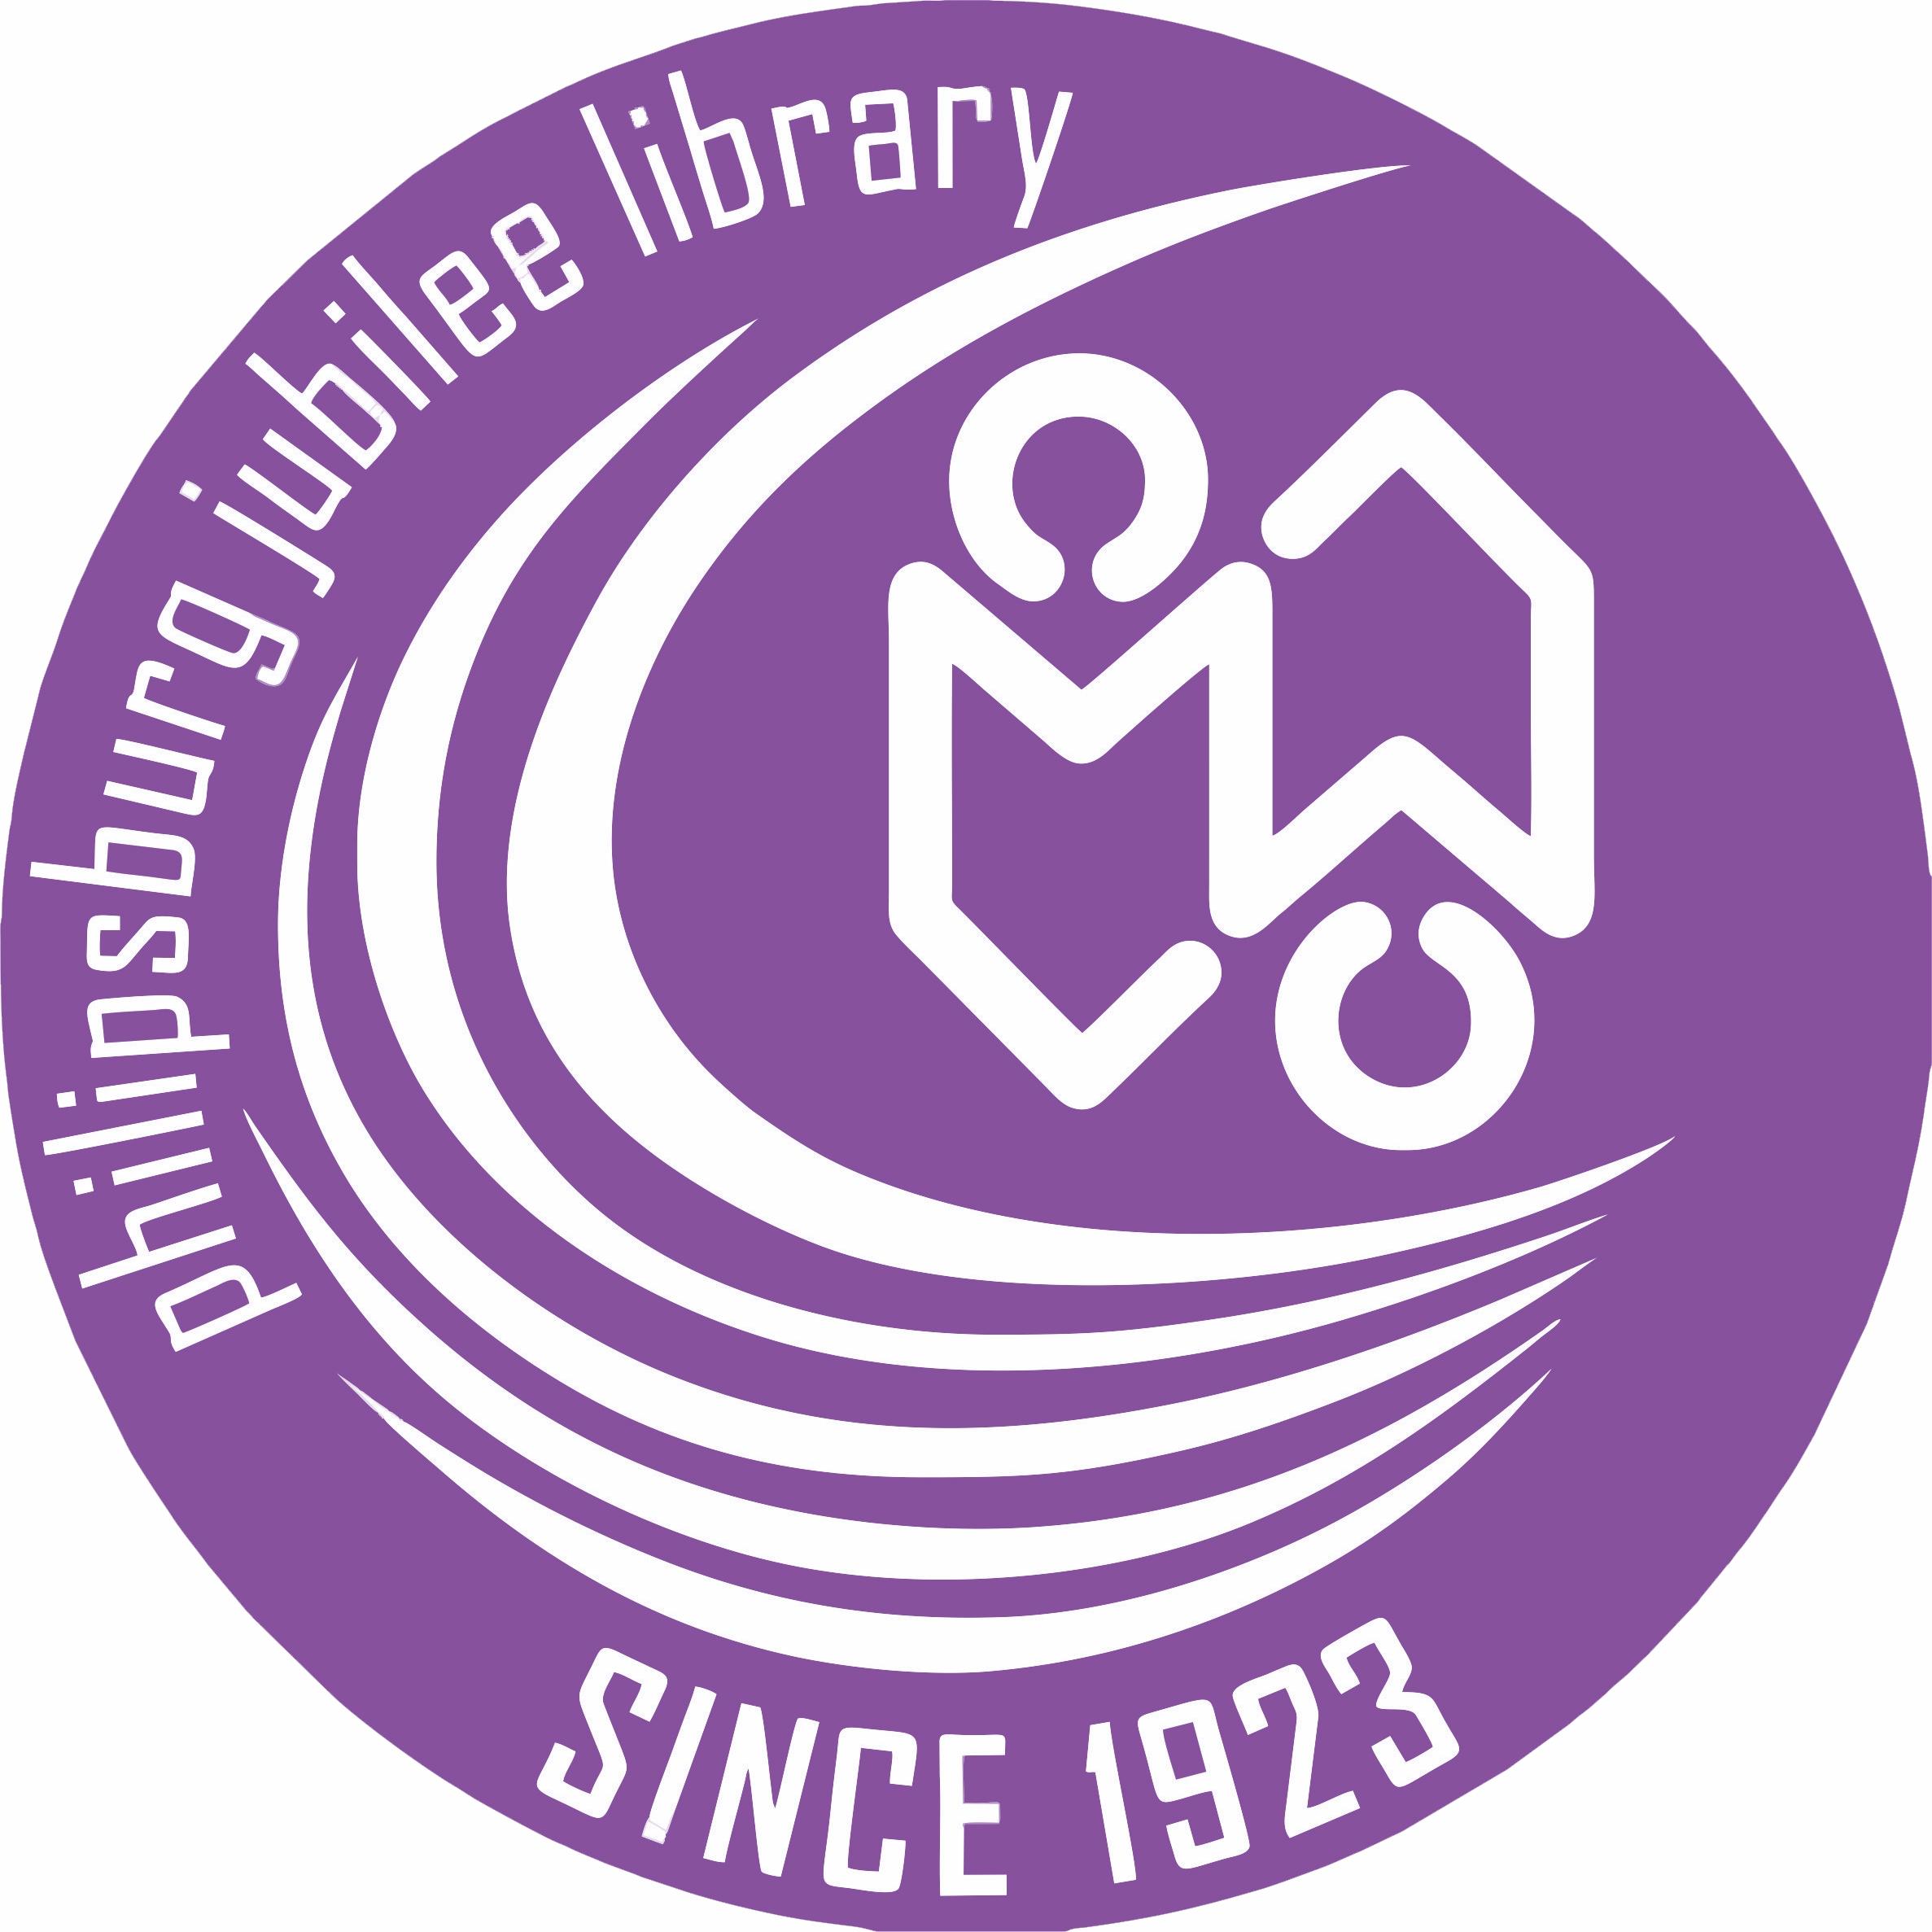 Philipsburg Jubilee Library